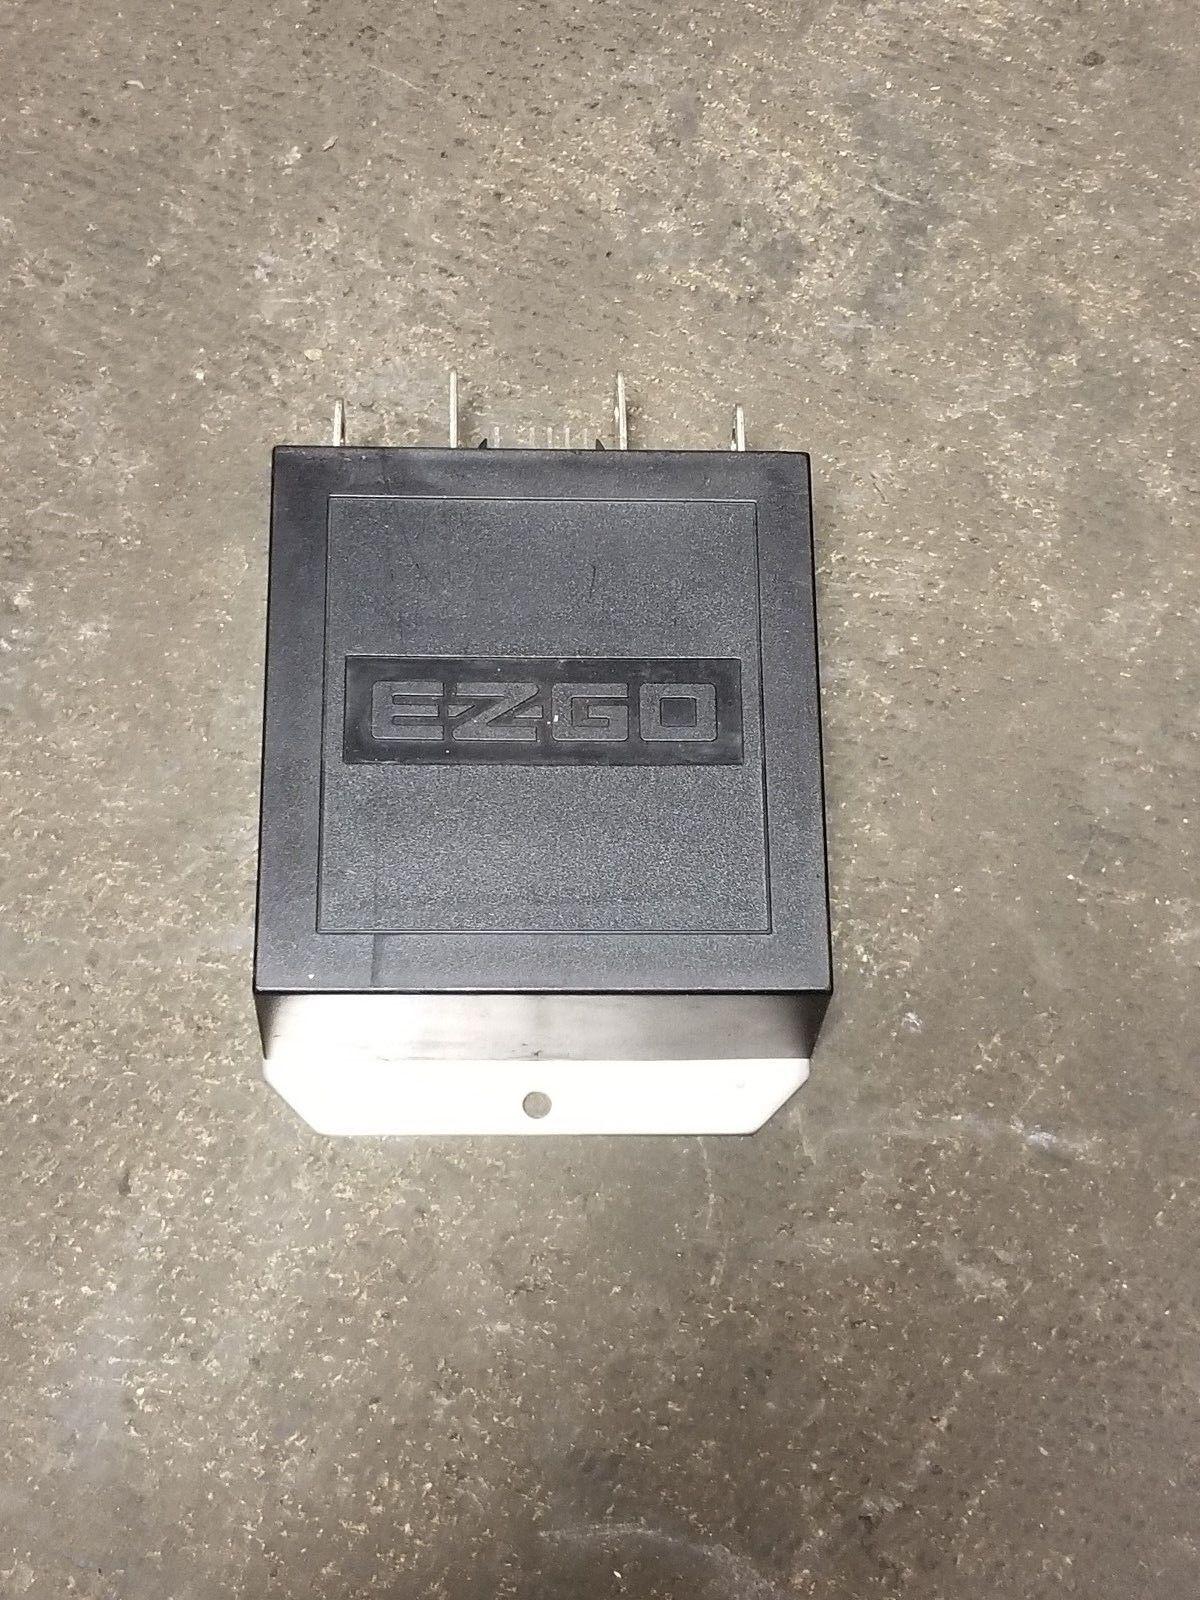 ezgo curtis 36v 36 volt motor controller txt series 1206 5 pin golf cart car forklift parts and accessories [ 1200 x 1600 Pixel ]